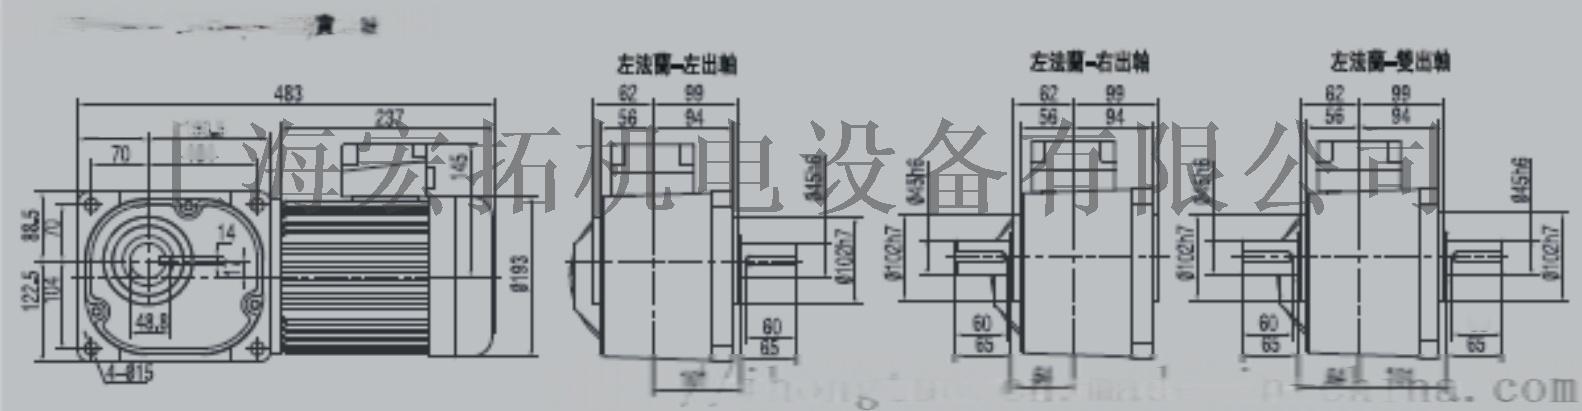 SGF45-S-1.5KW-(5-120)實心軸.png